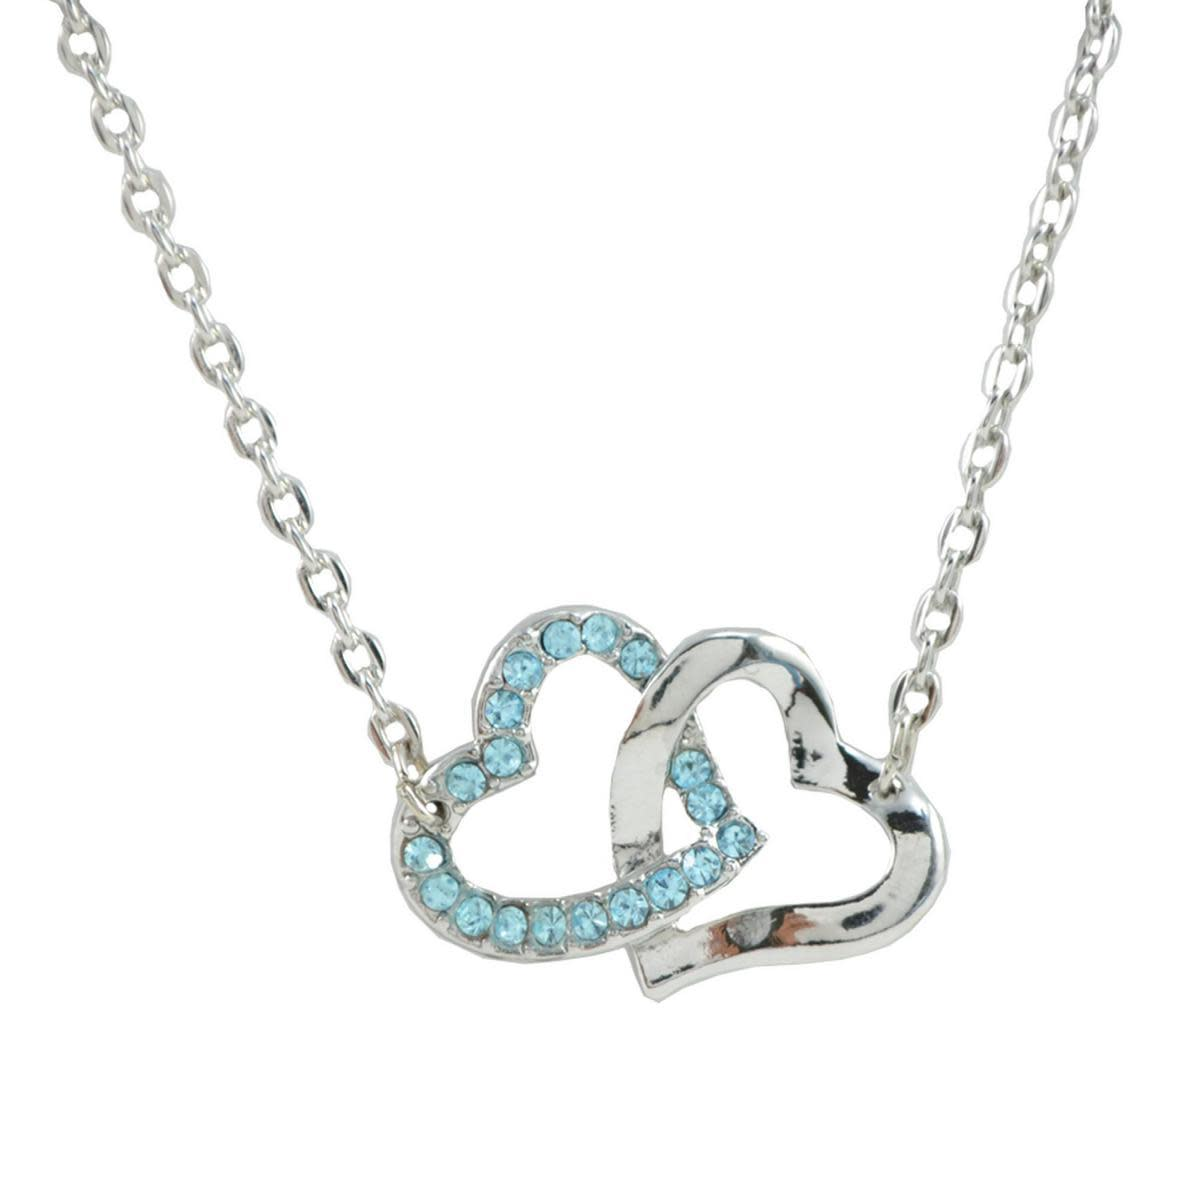 Two hearts pendant